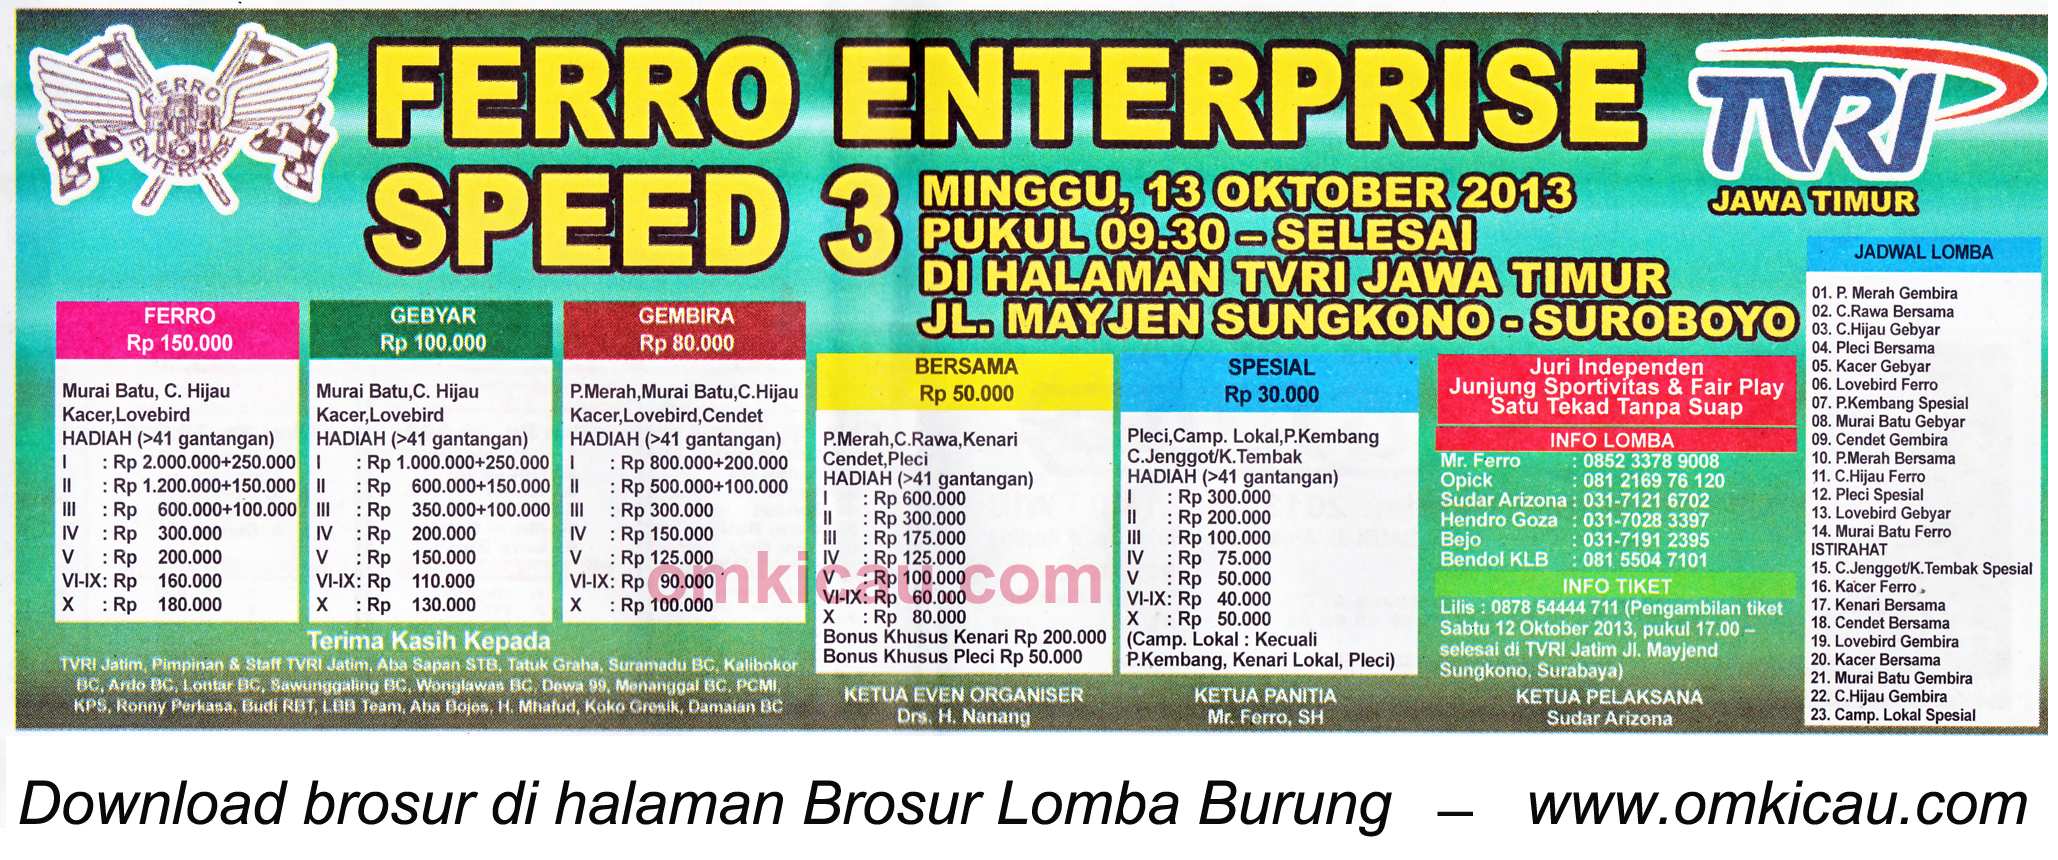 Brosur Lomba Burung Berkicau Ferro Enterprise Speed 3, Surabaya, 13 Oktober 2013